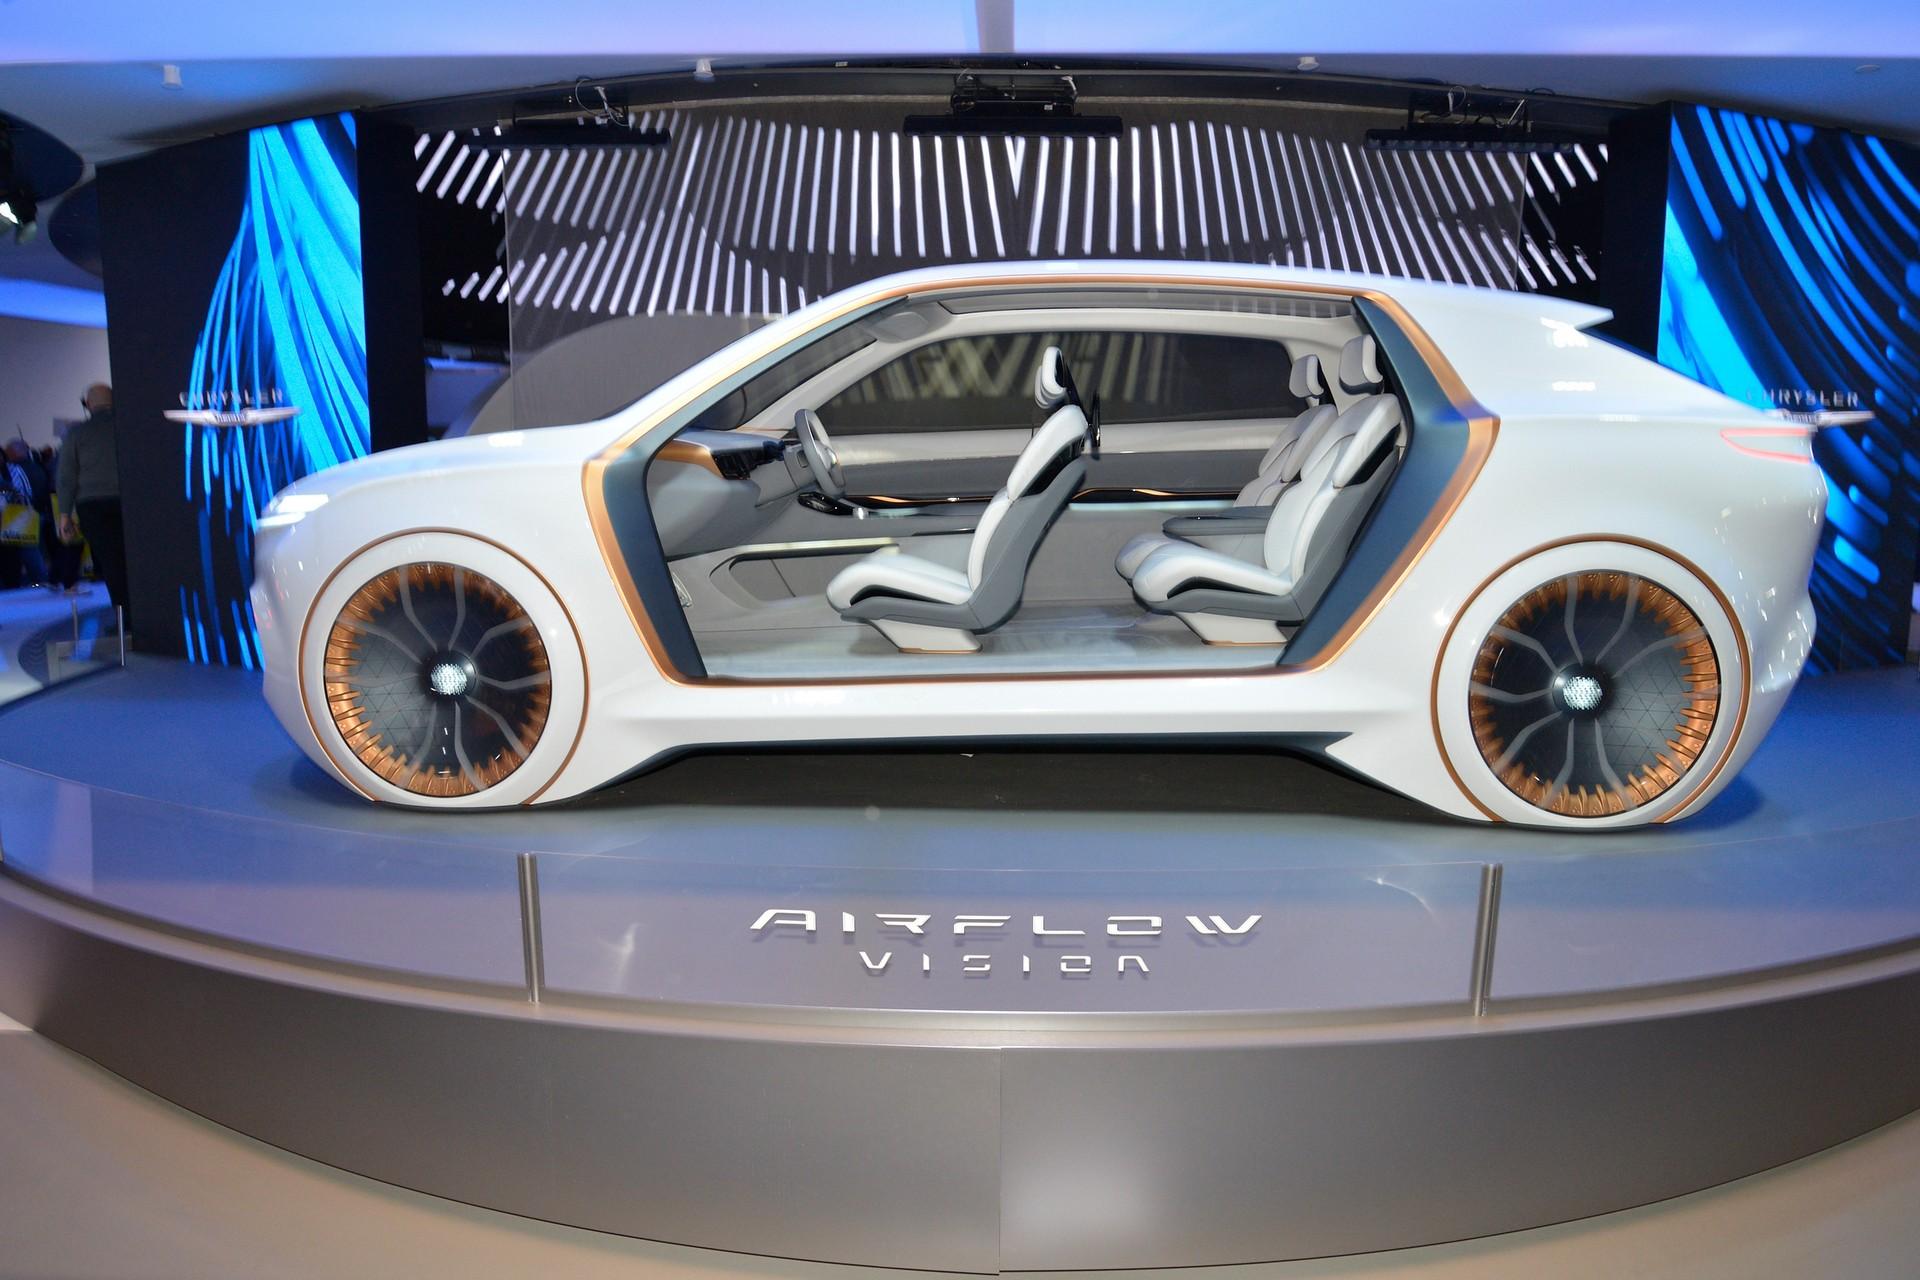 Chrysler-Airflow-Vision-Concept-3.jpeg